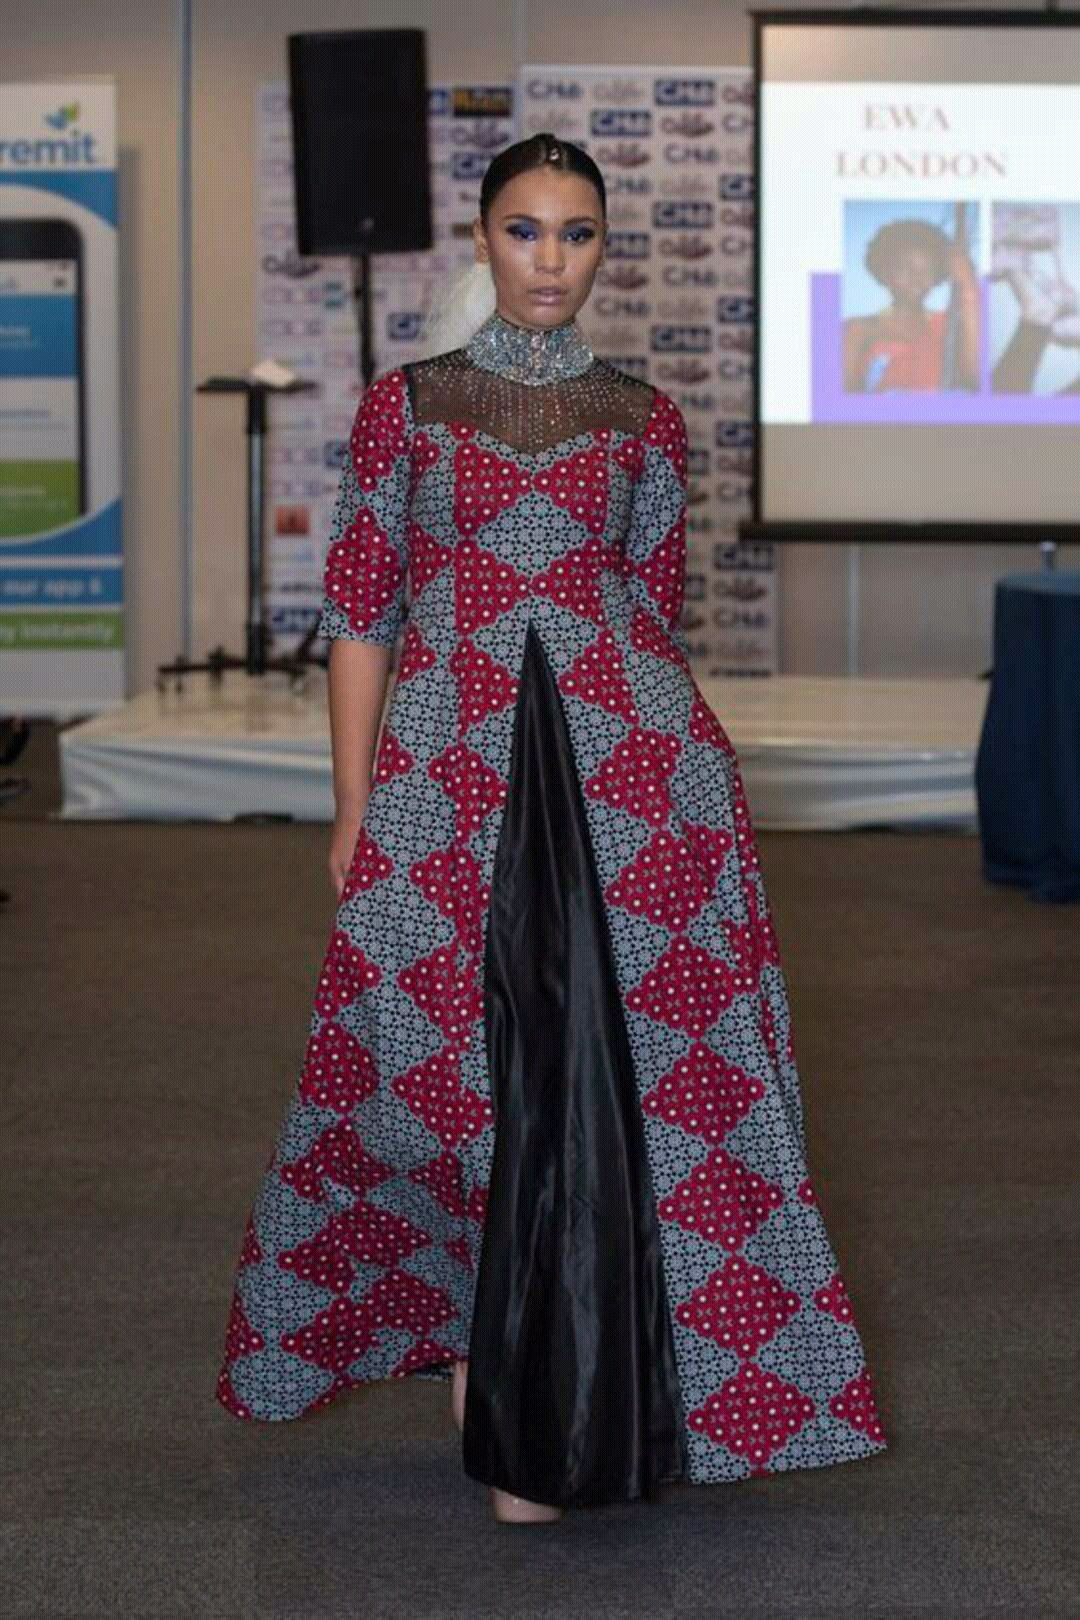 50 tenues en pagne pour hommes femmes et enfants wakanda inspired fashion pinterest. Black Bedroom Furniture Sets. Home Design Ideas